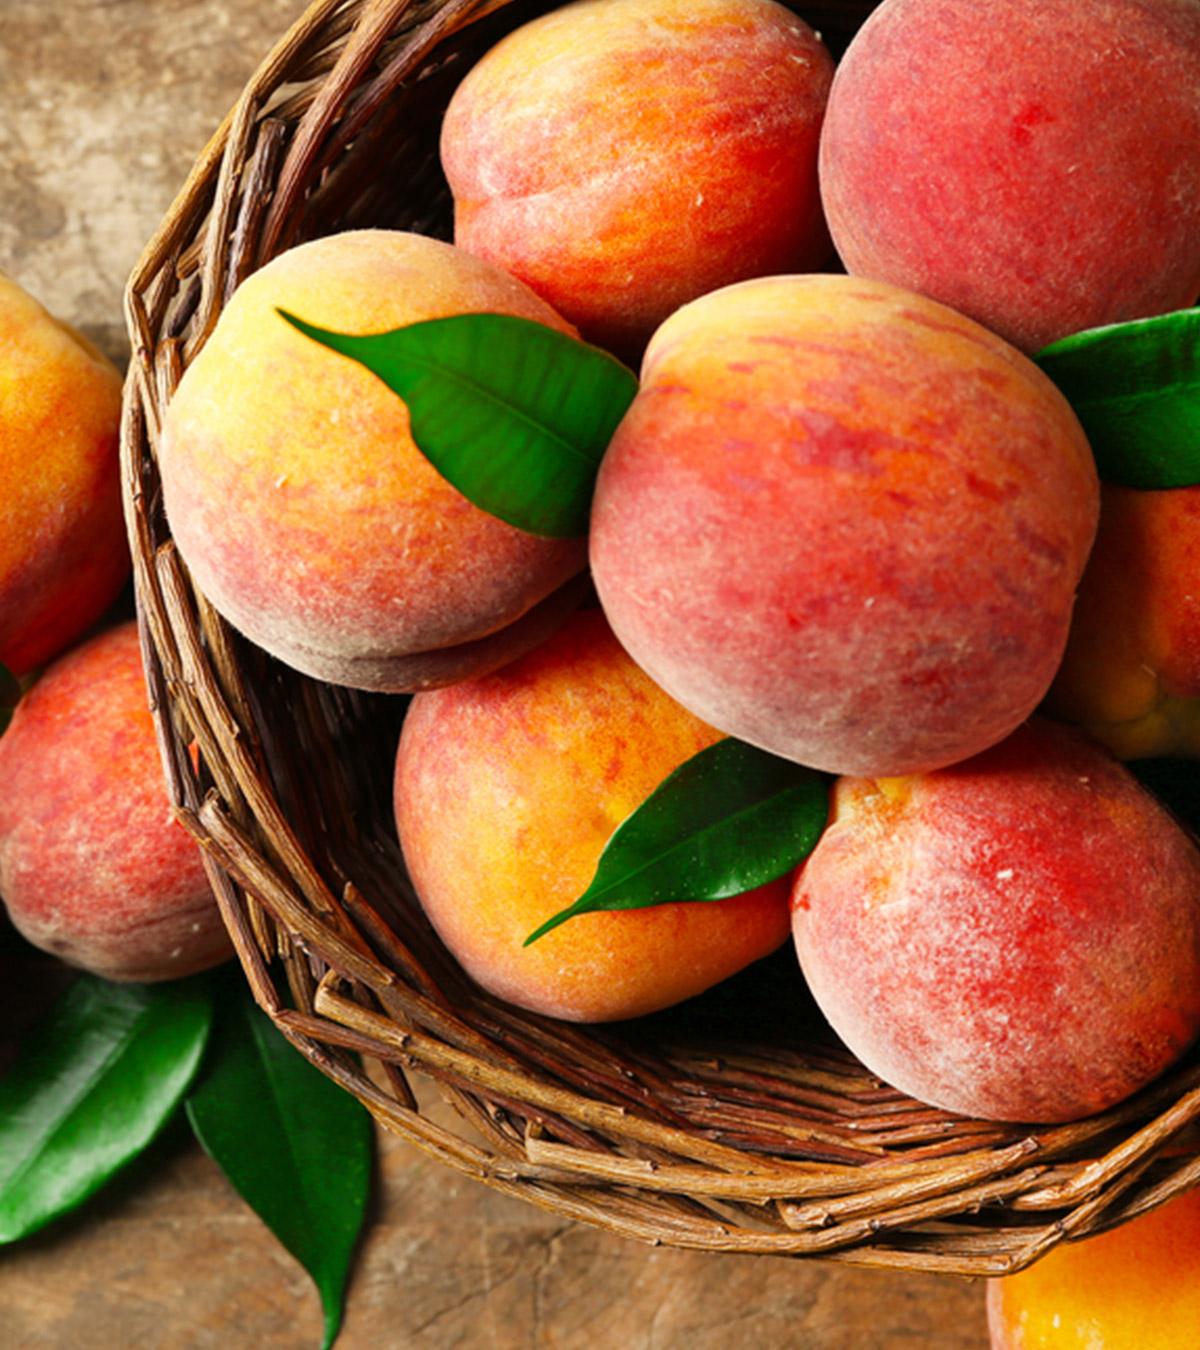 Peach Aadu fruit Benefits